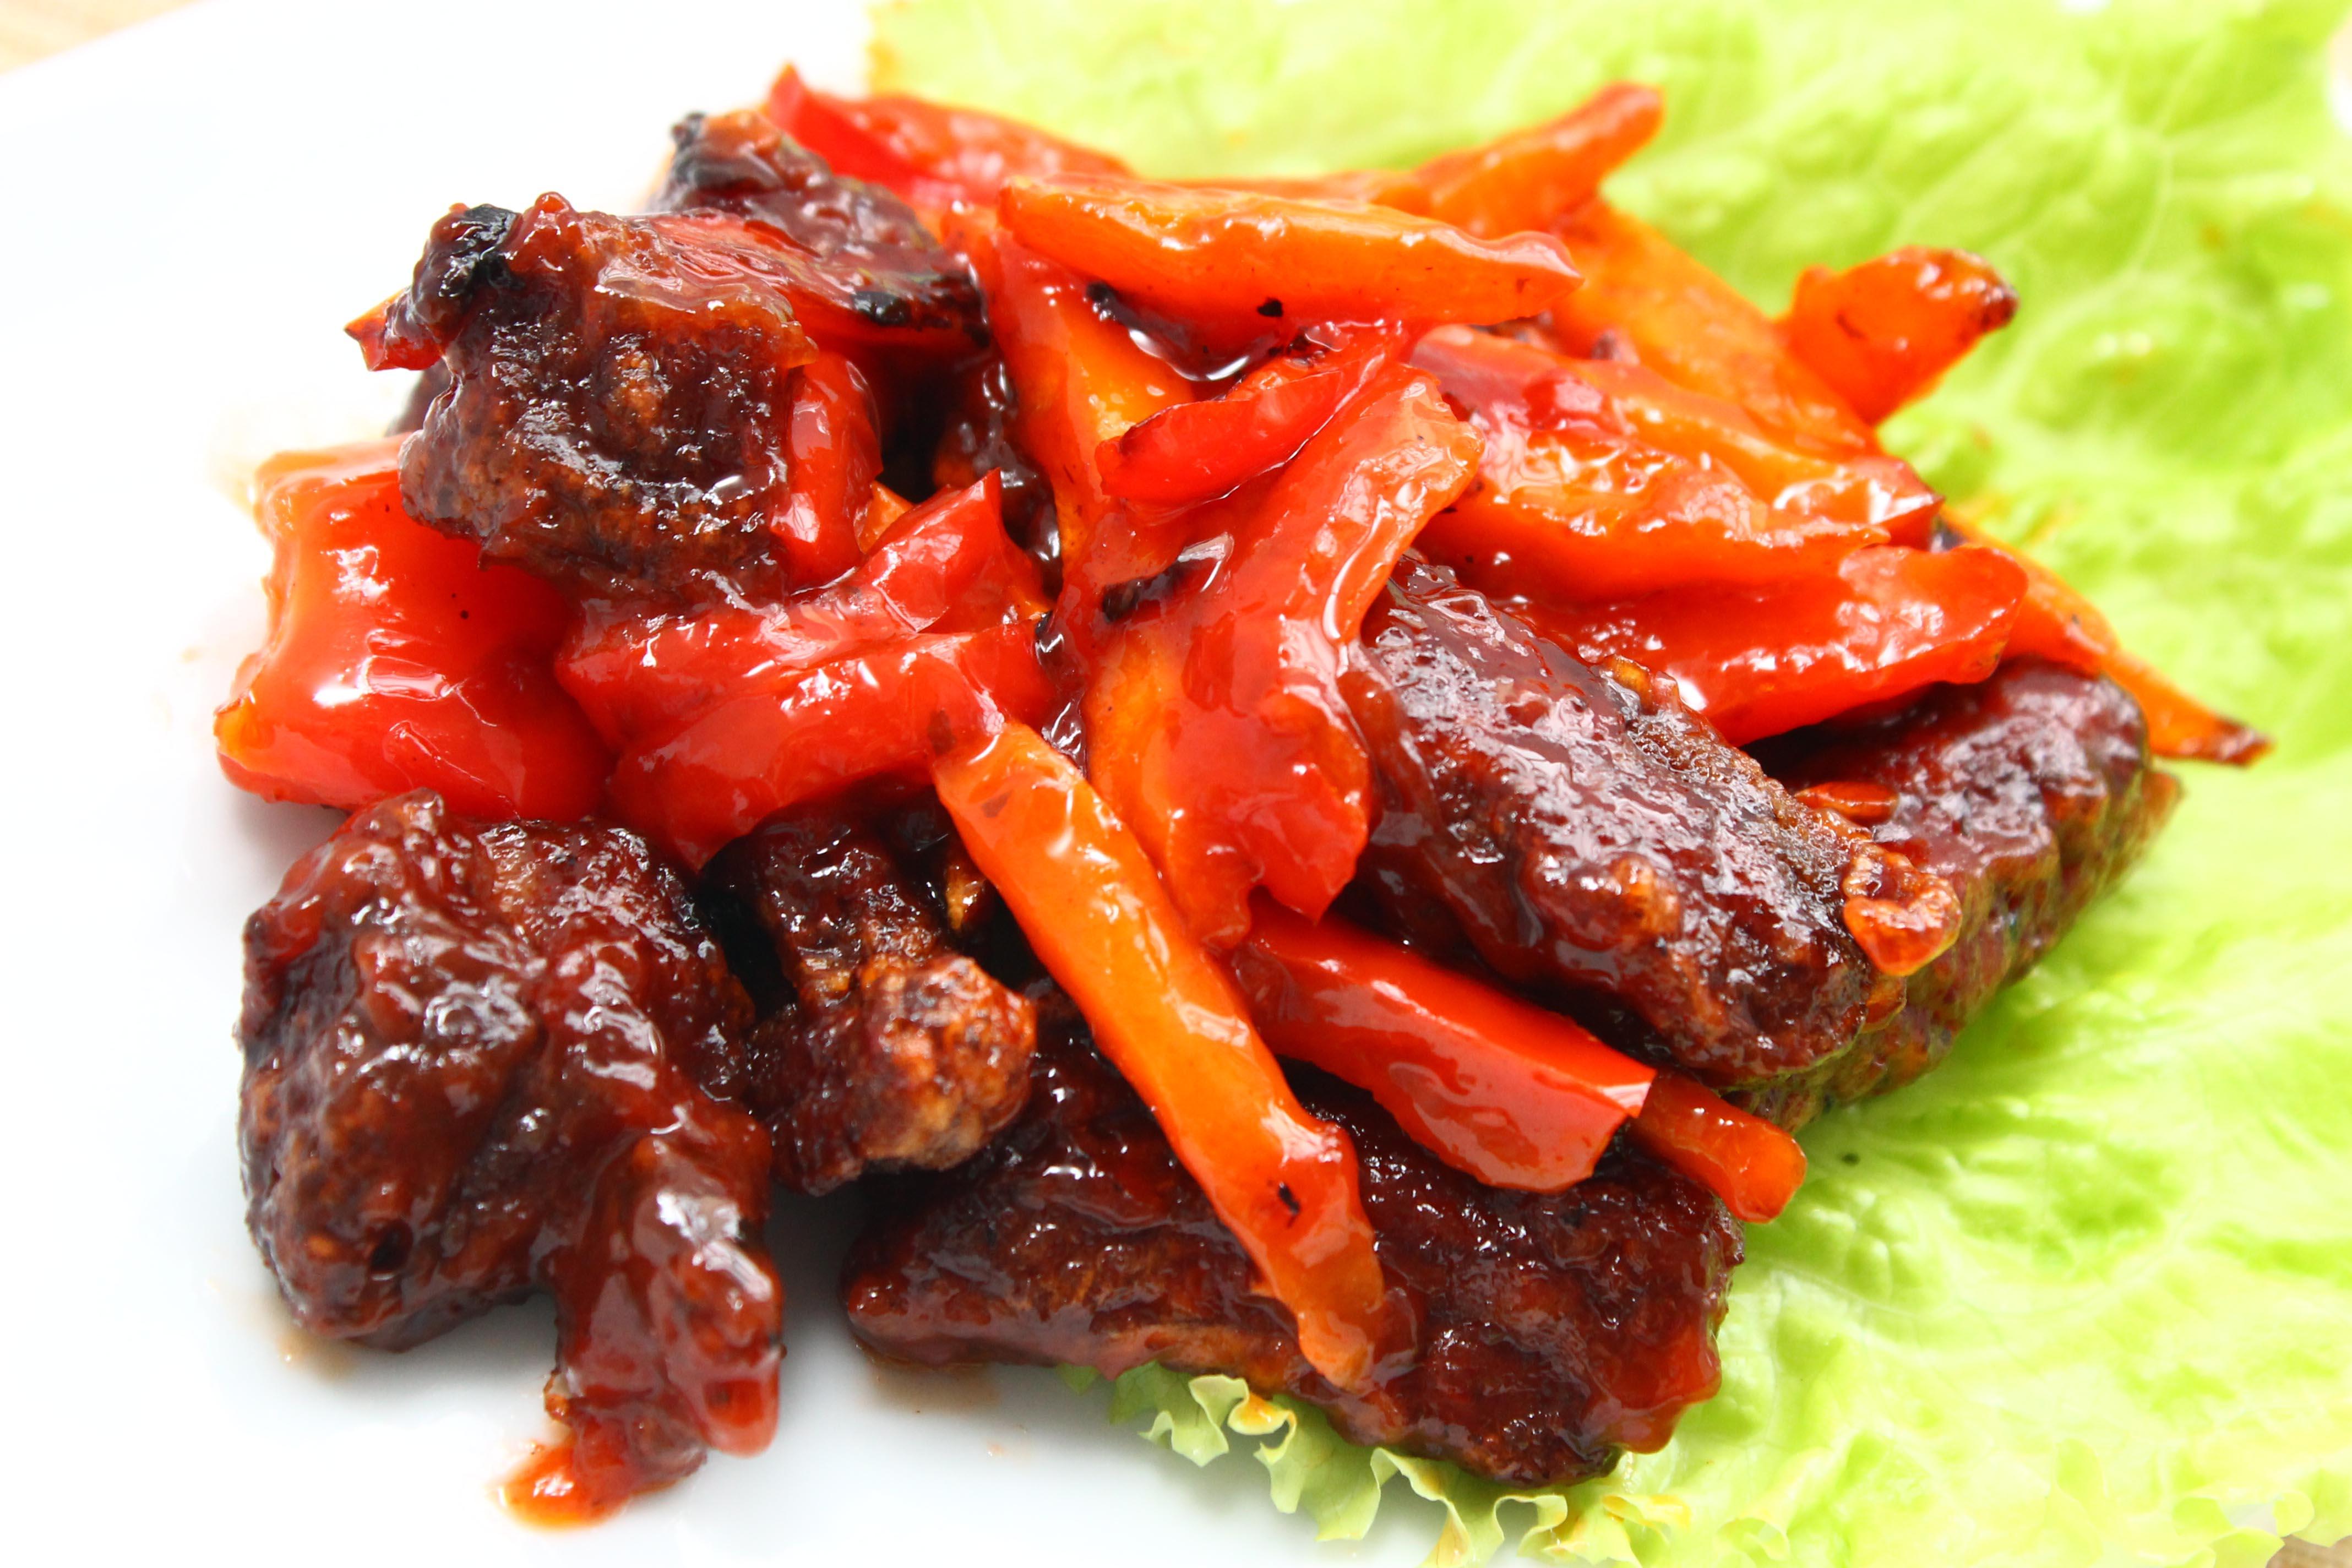 мясо в овощами в мультиварке рецепты с фото